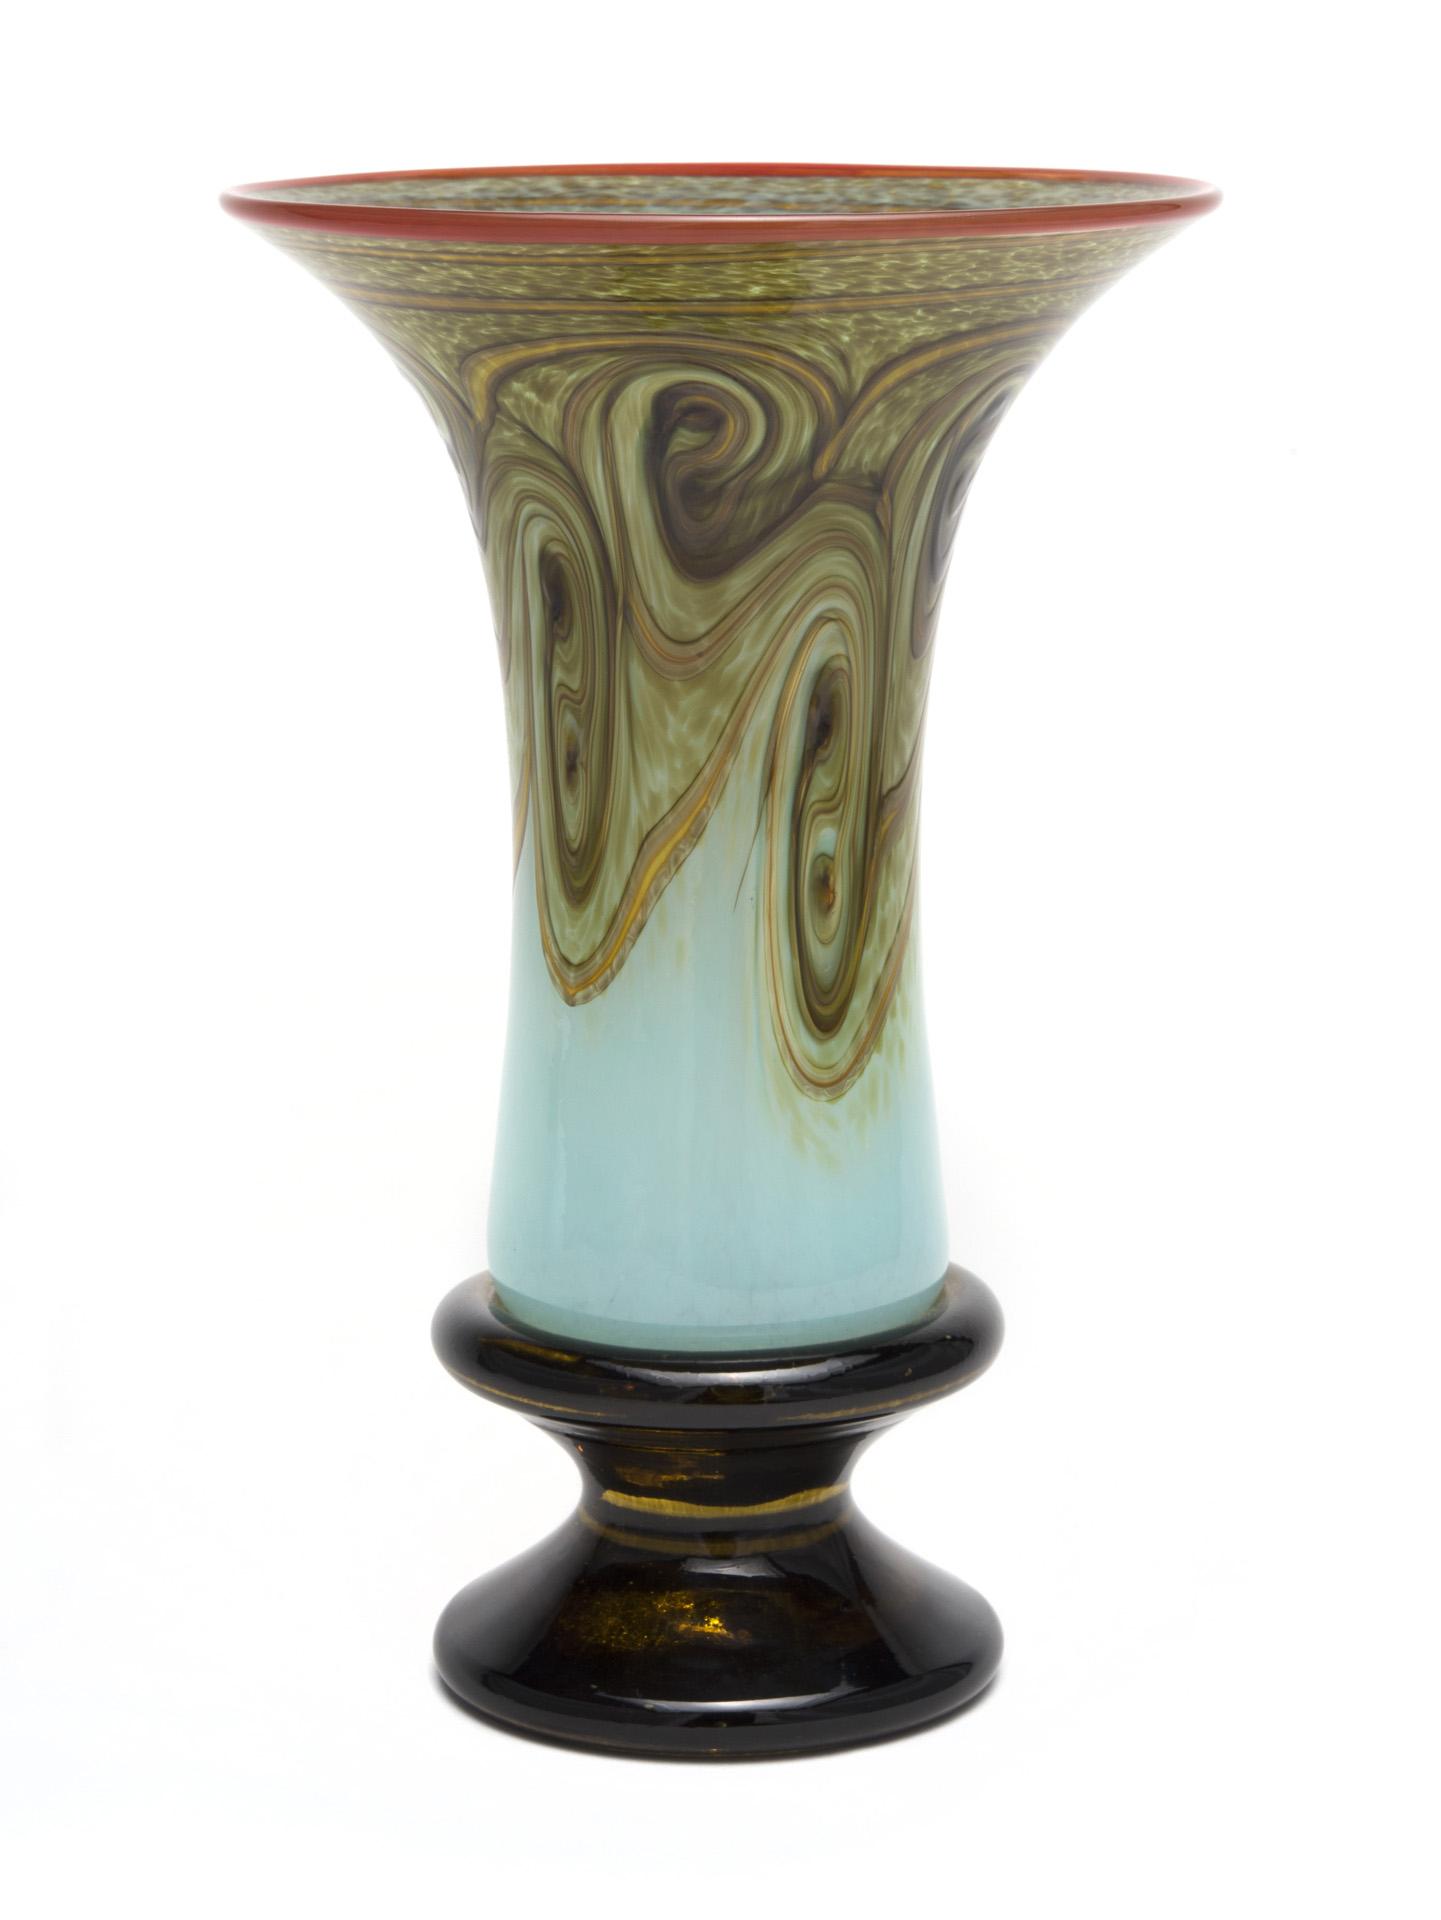 Pedestal Vase- Celadon Swirl zapp.jpg